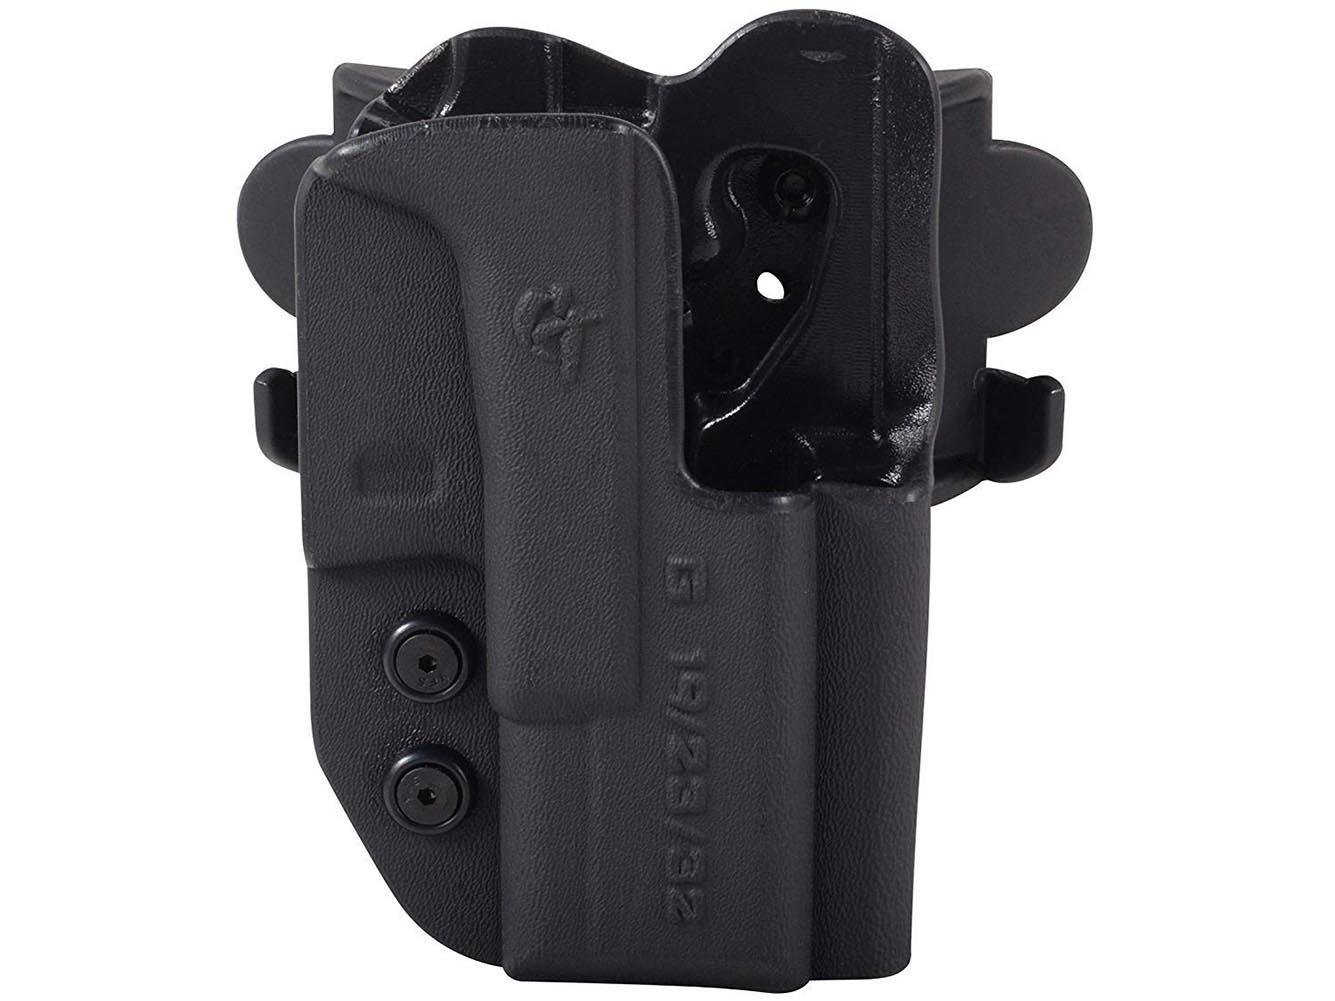 COMP-TAC International OWB Modular Mount RSC Holster For Glock 19/23/32 Gen 1-4 RSC (C241GL051RBKN)